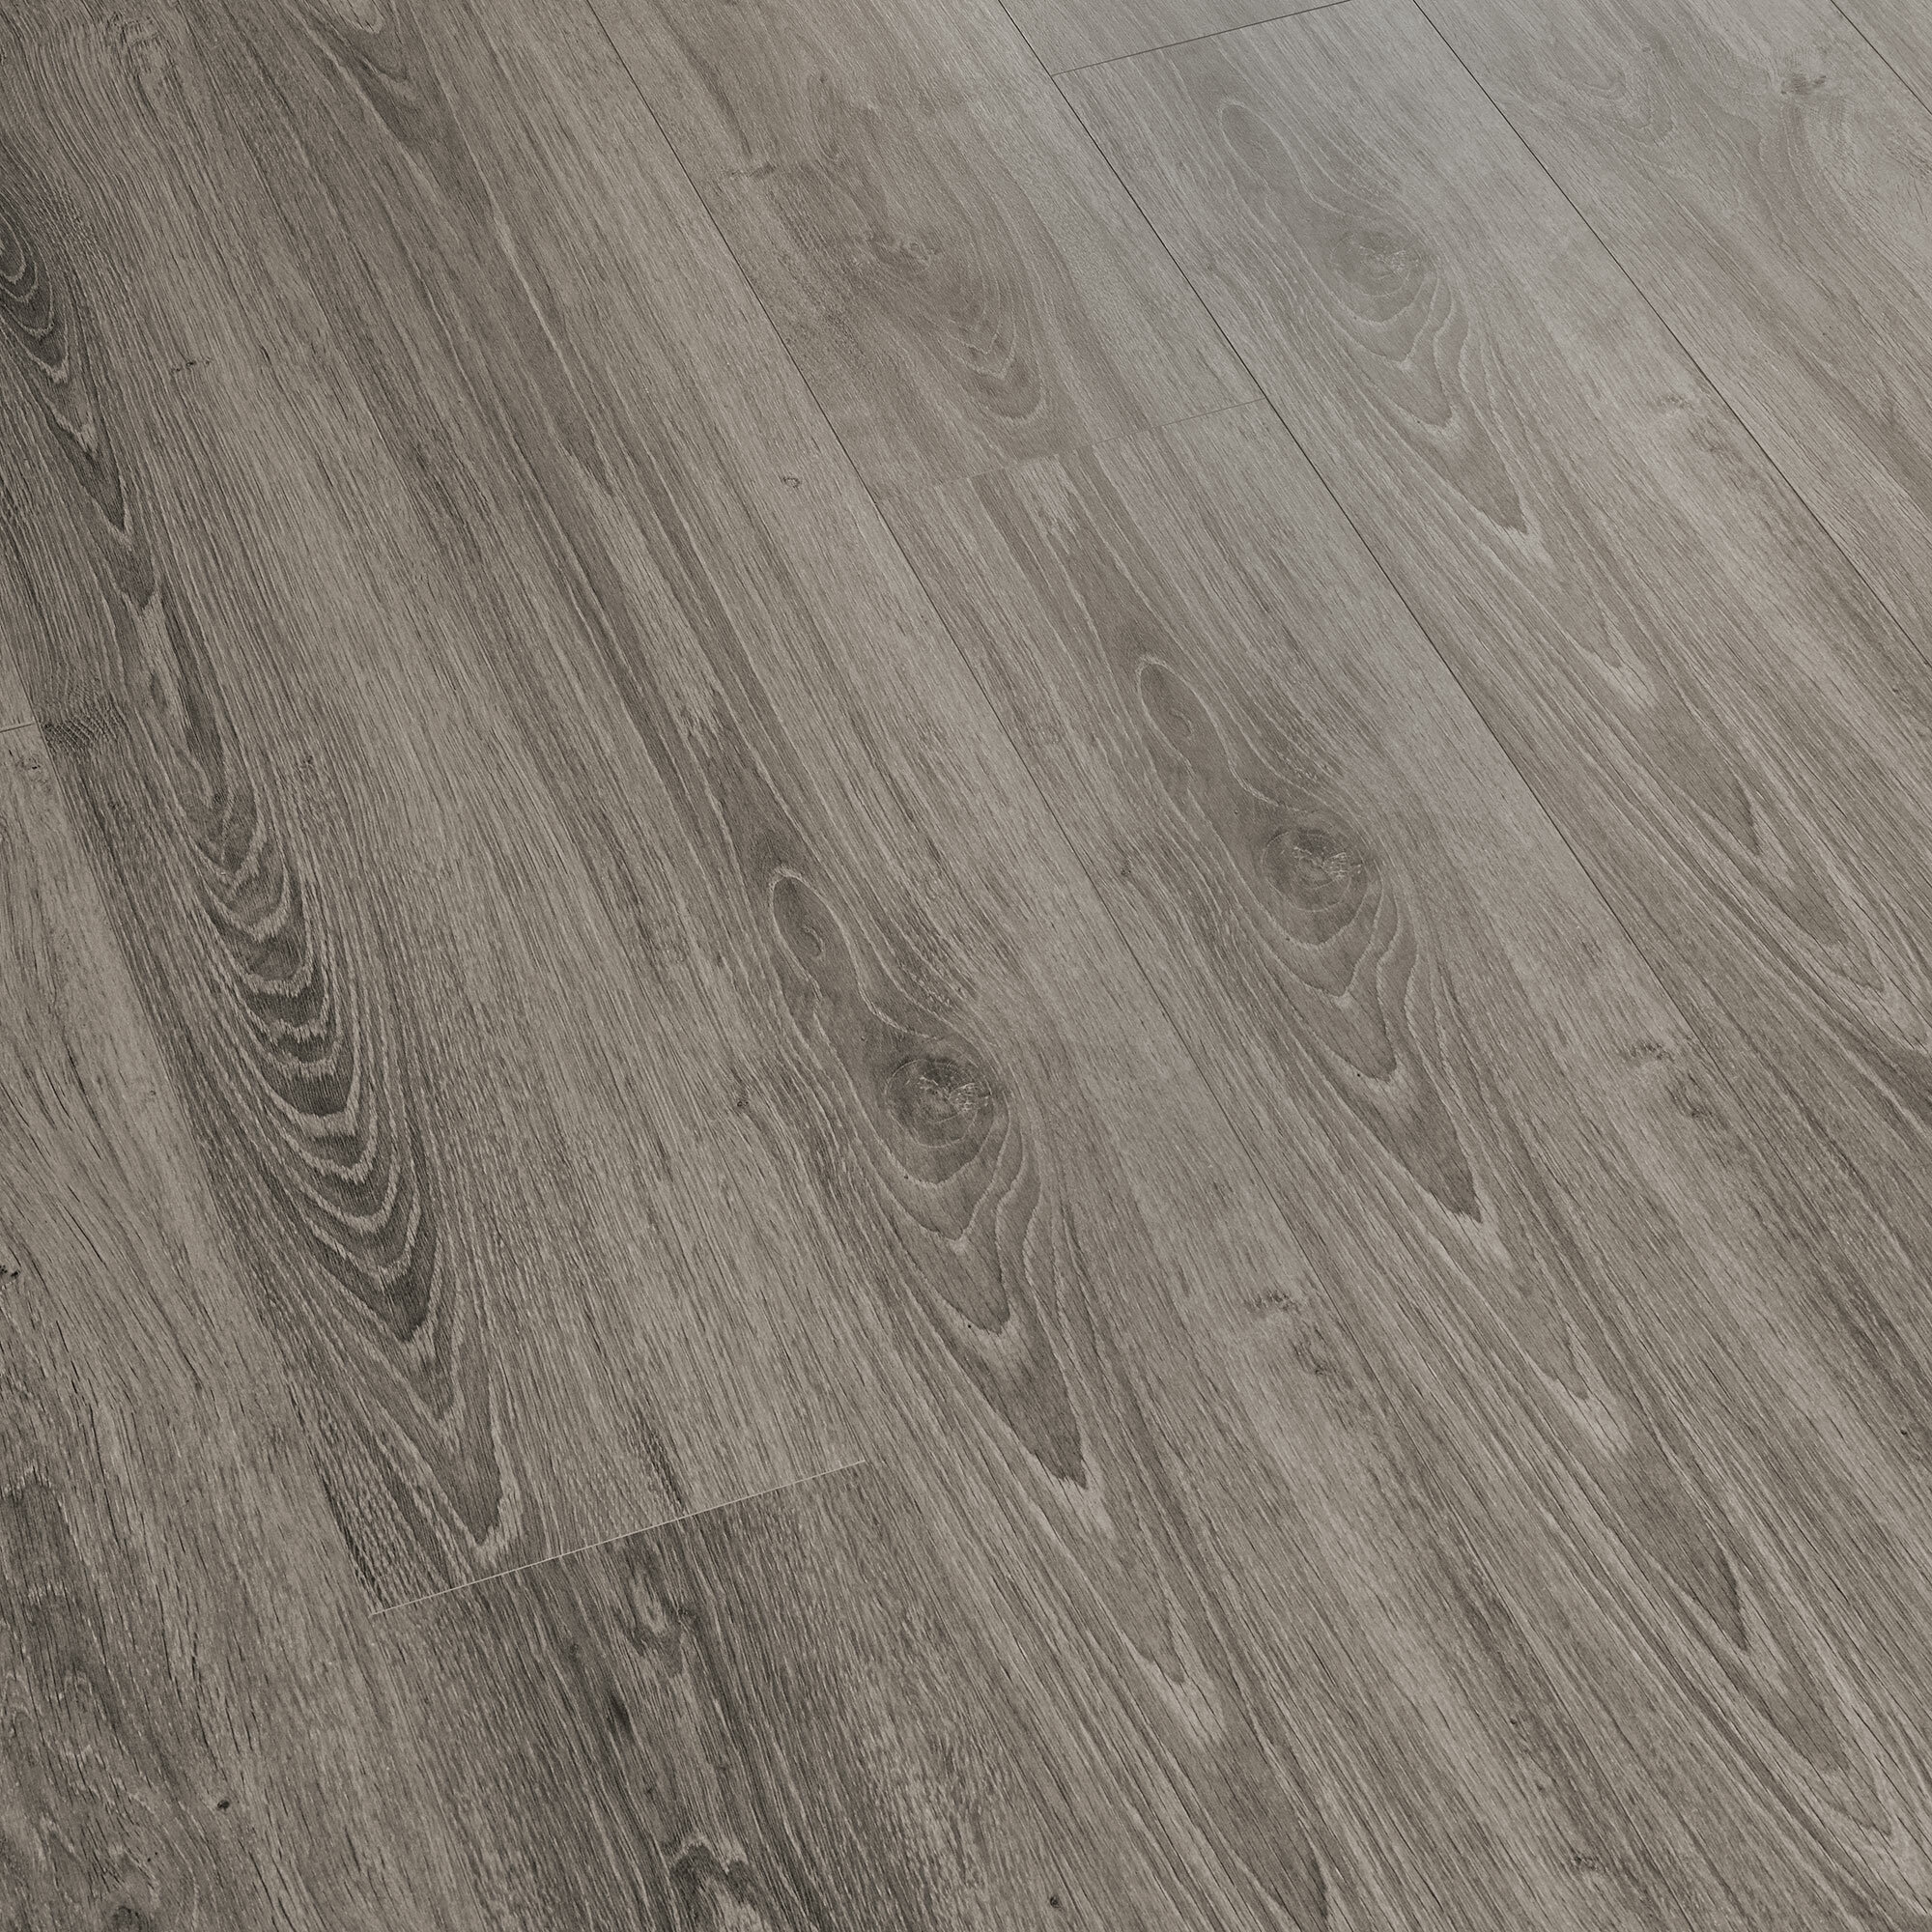 X 8mm Pine Laminate Flooring